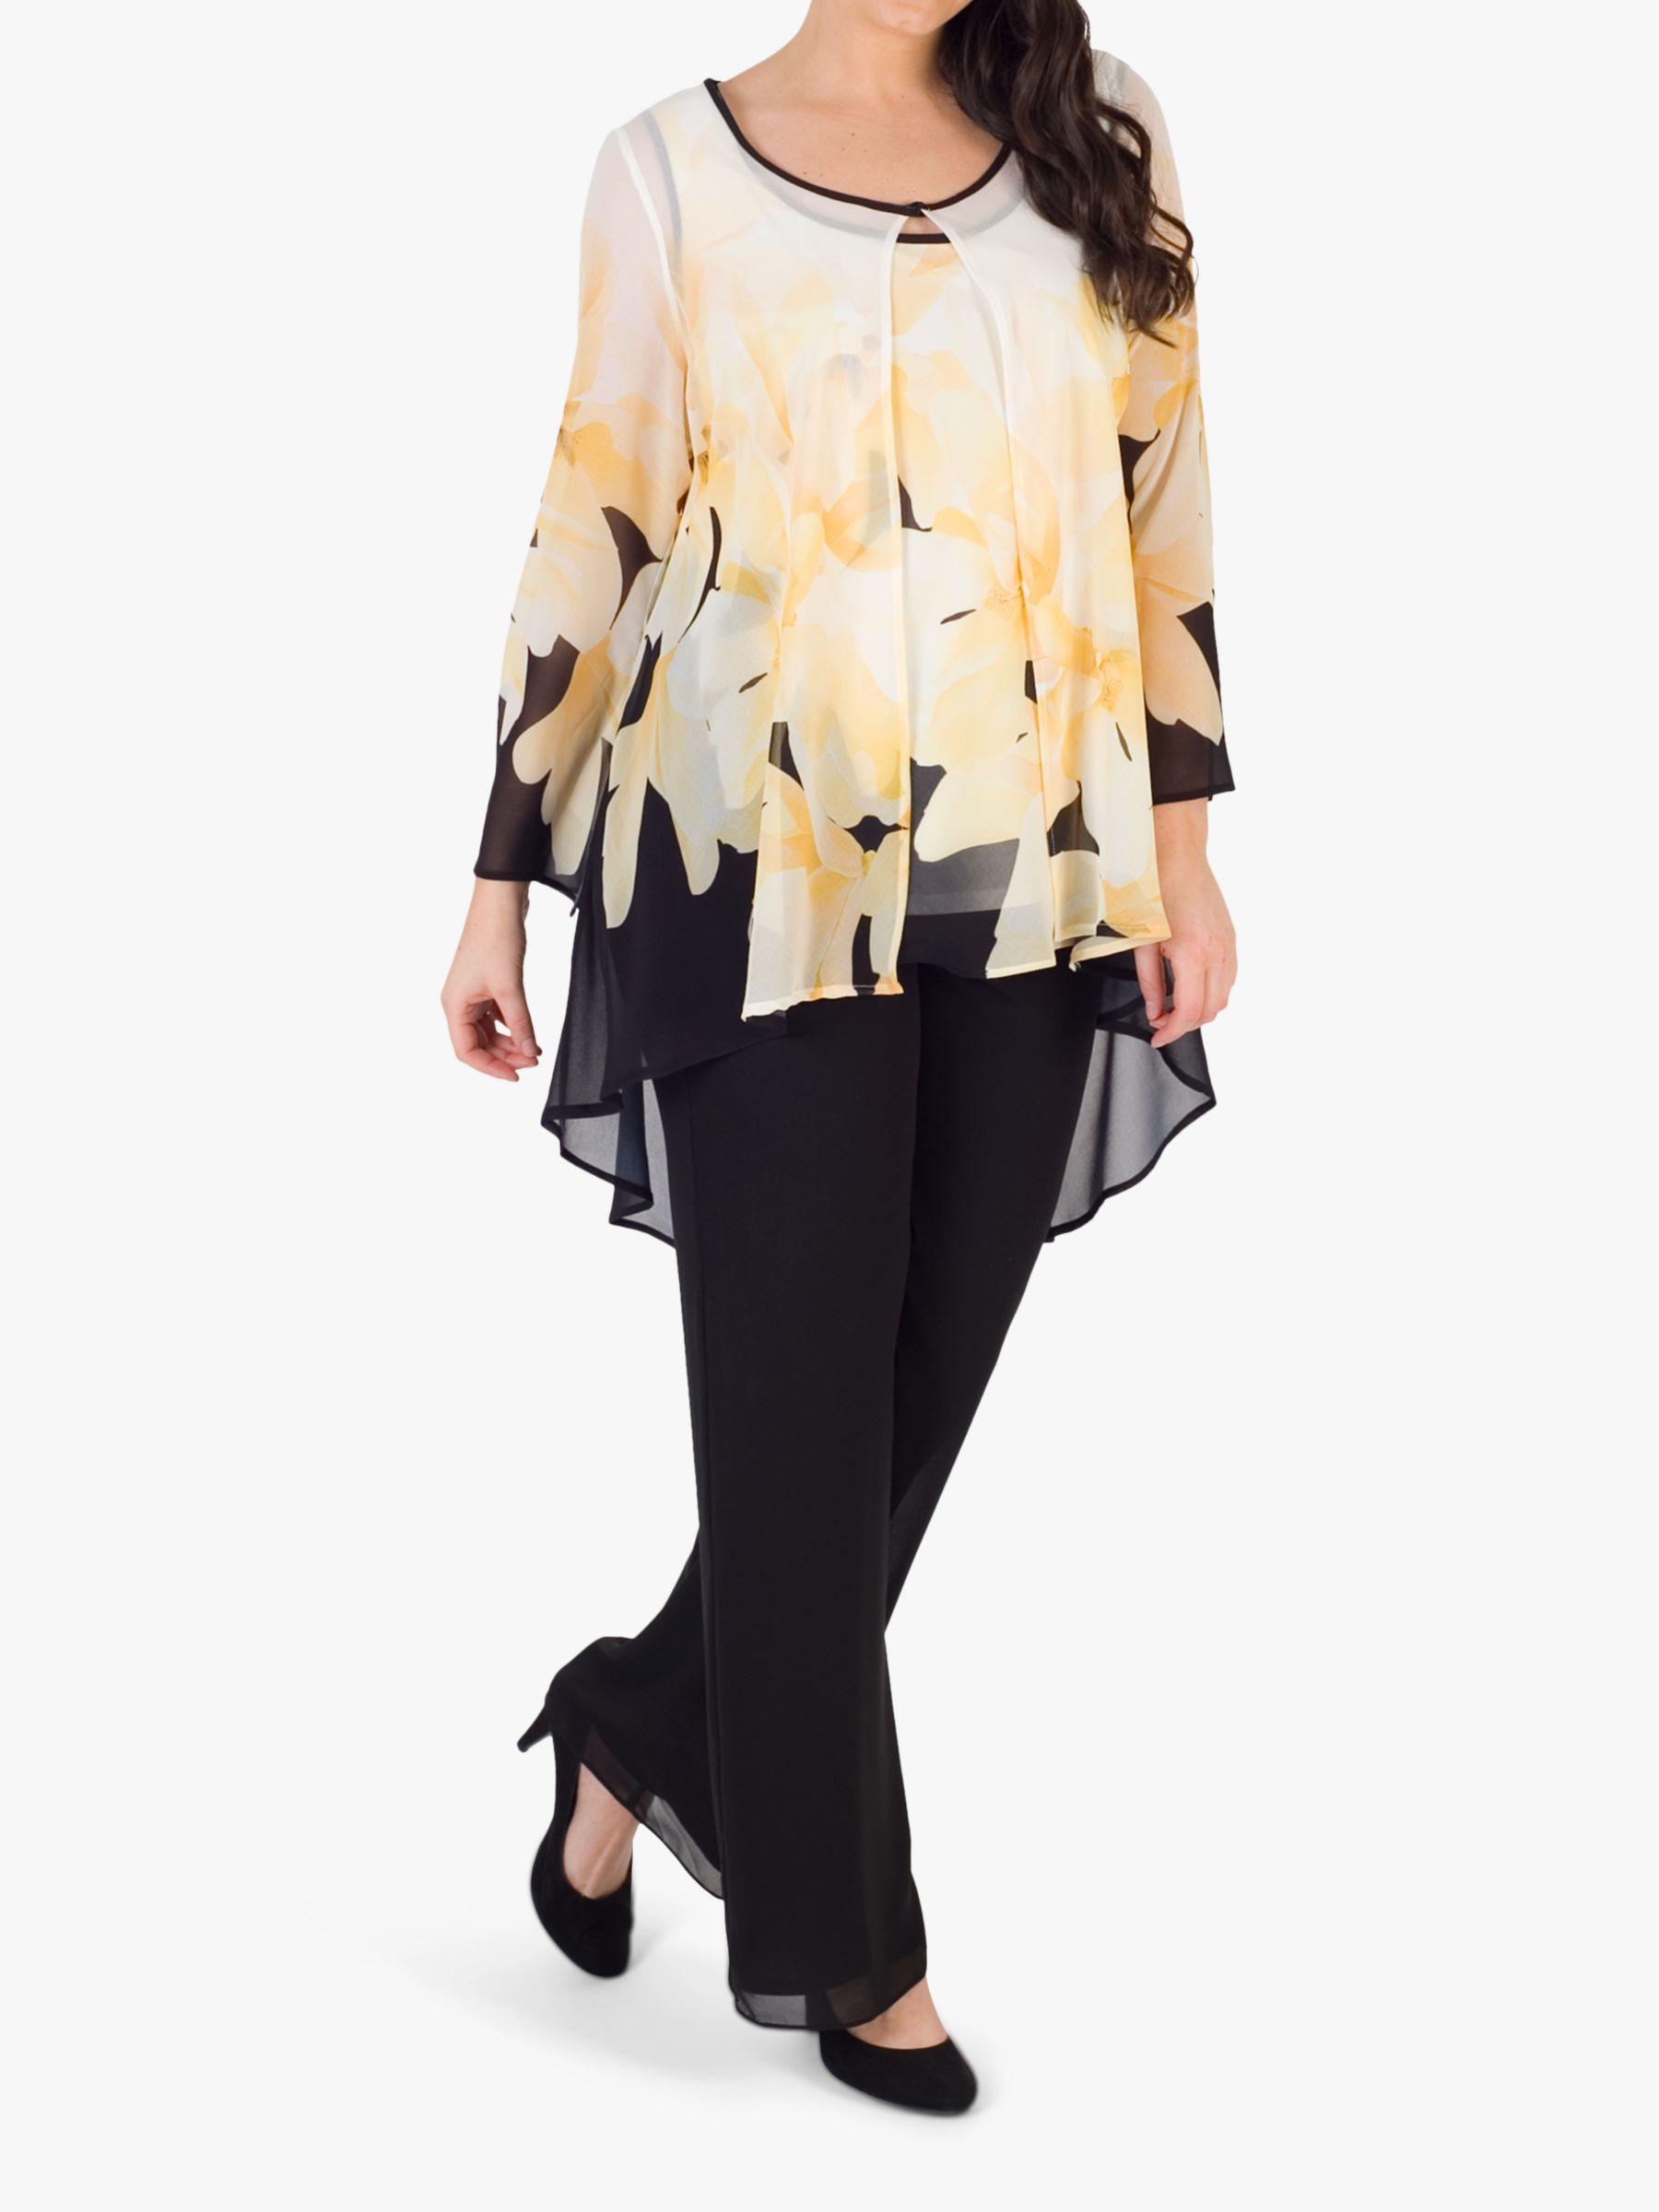 Chesca chesca Semi-Sheer Floral Print Chiffon Jacket, Black/Yellow/Ivory